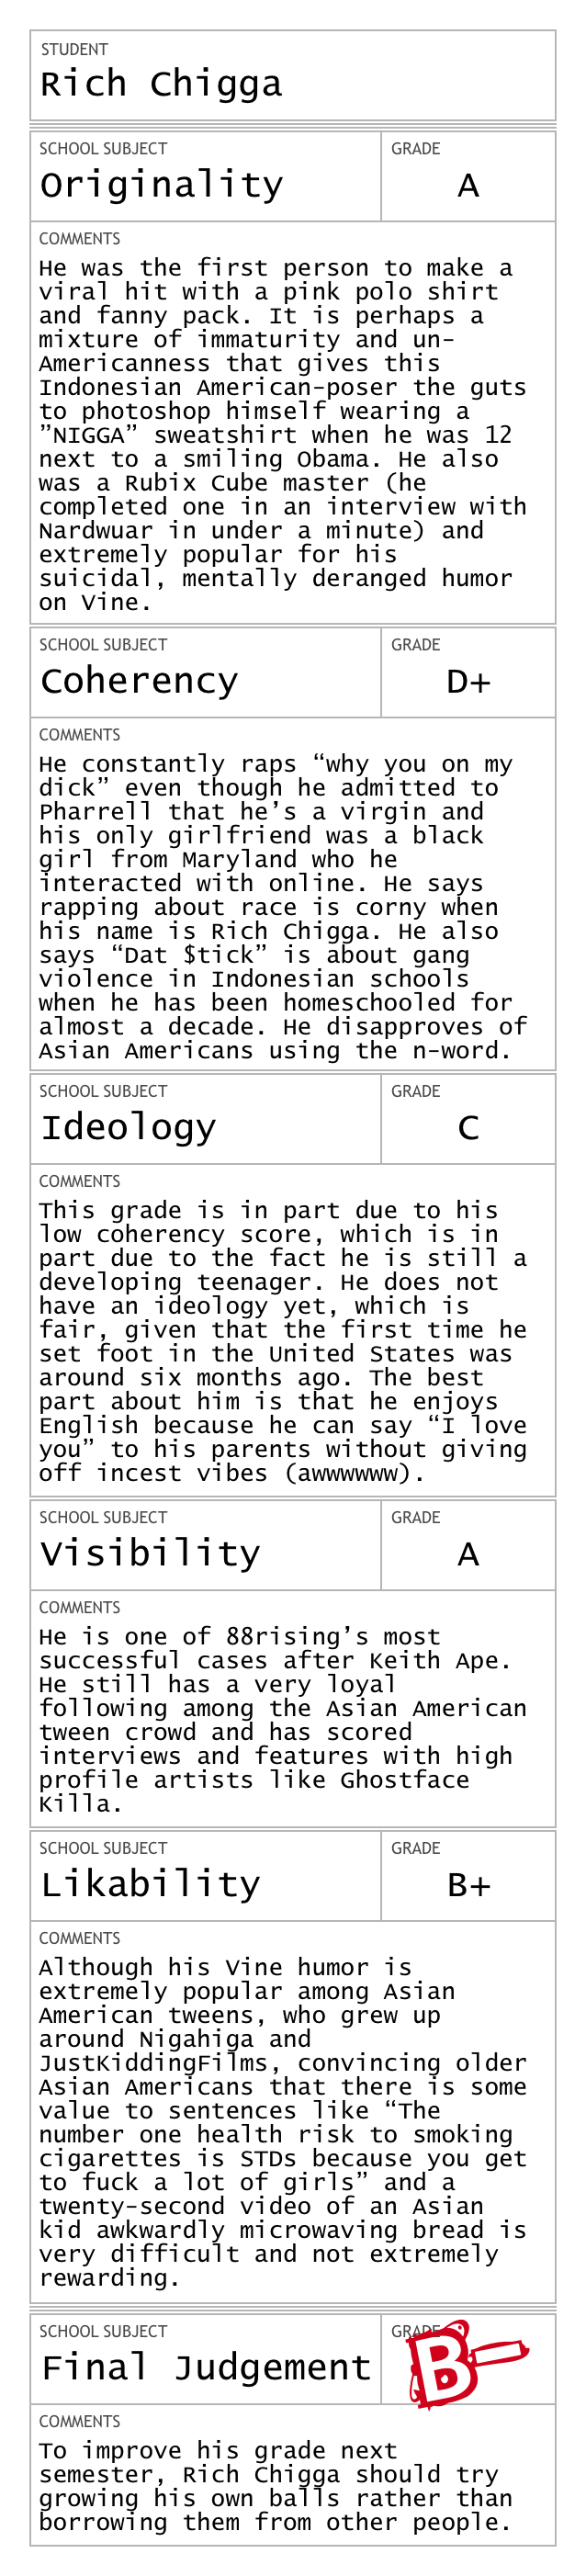 Report Card for Rich Chigga (AKA Rich Brian)